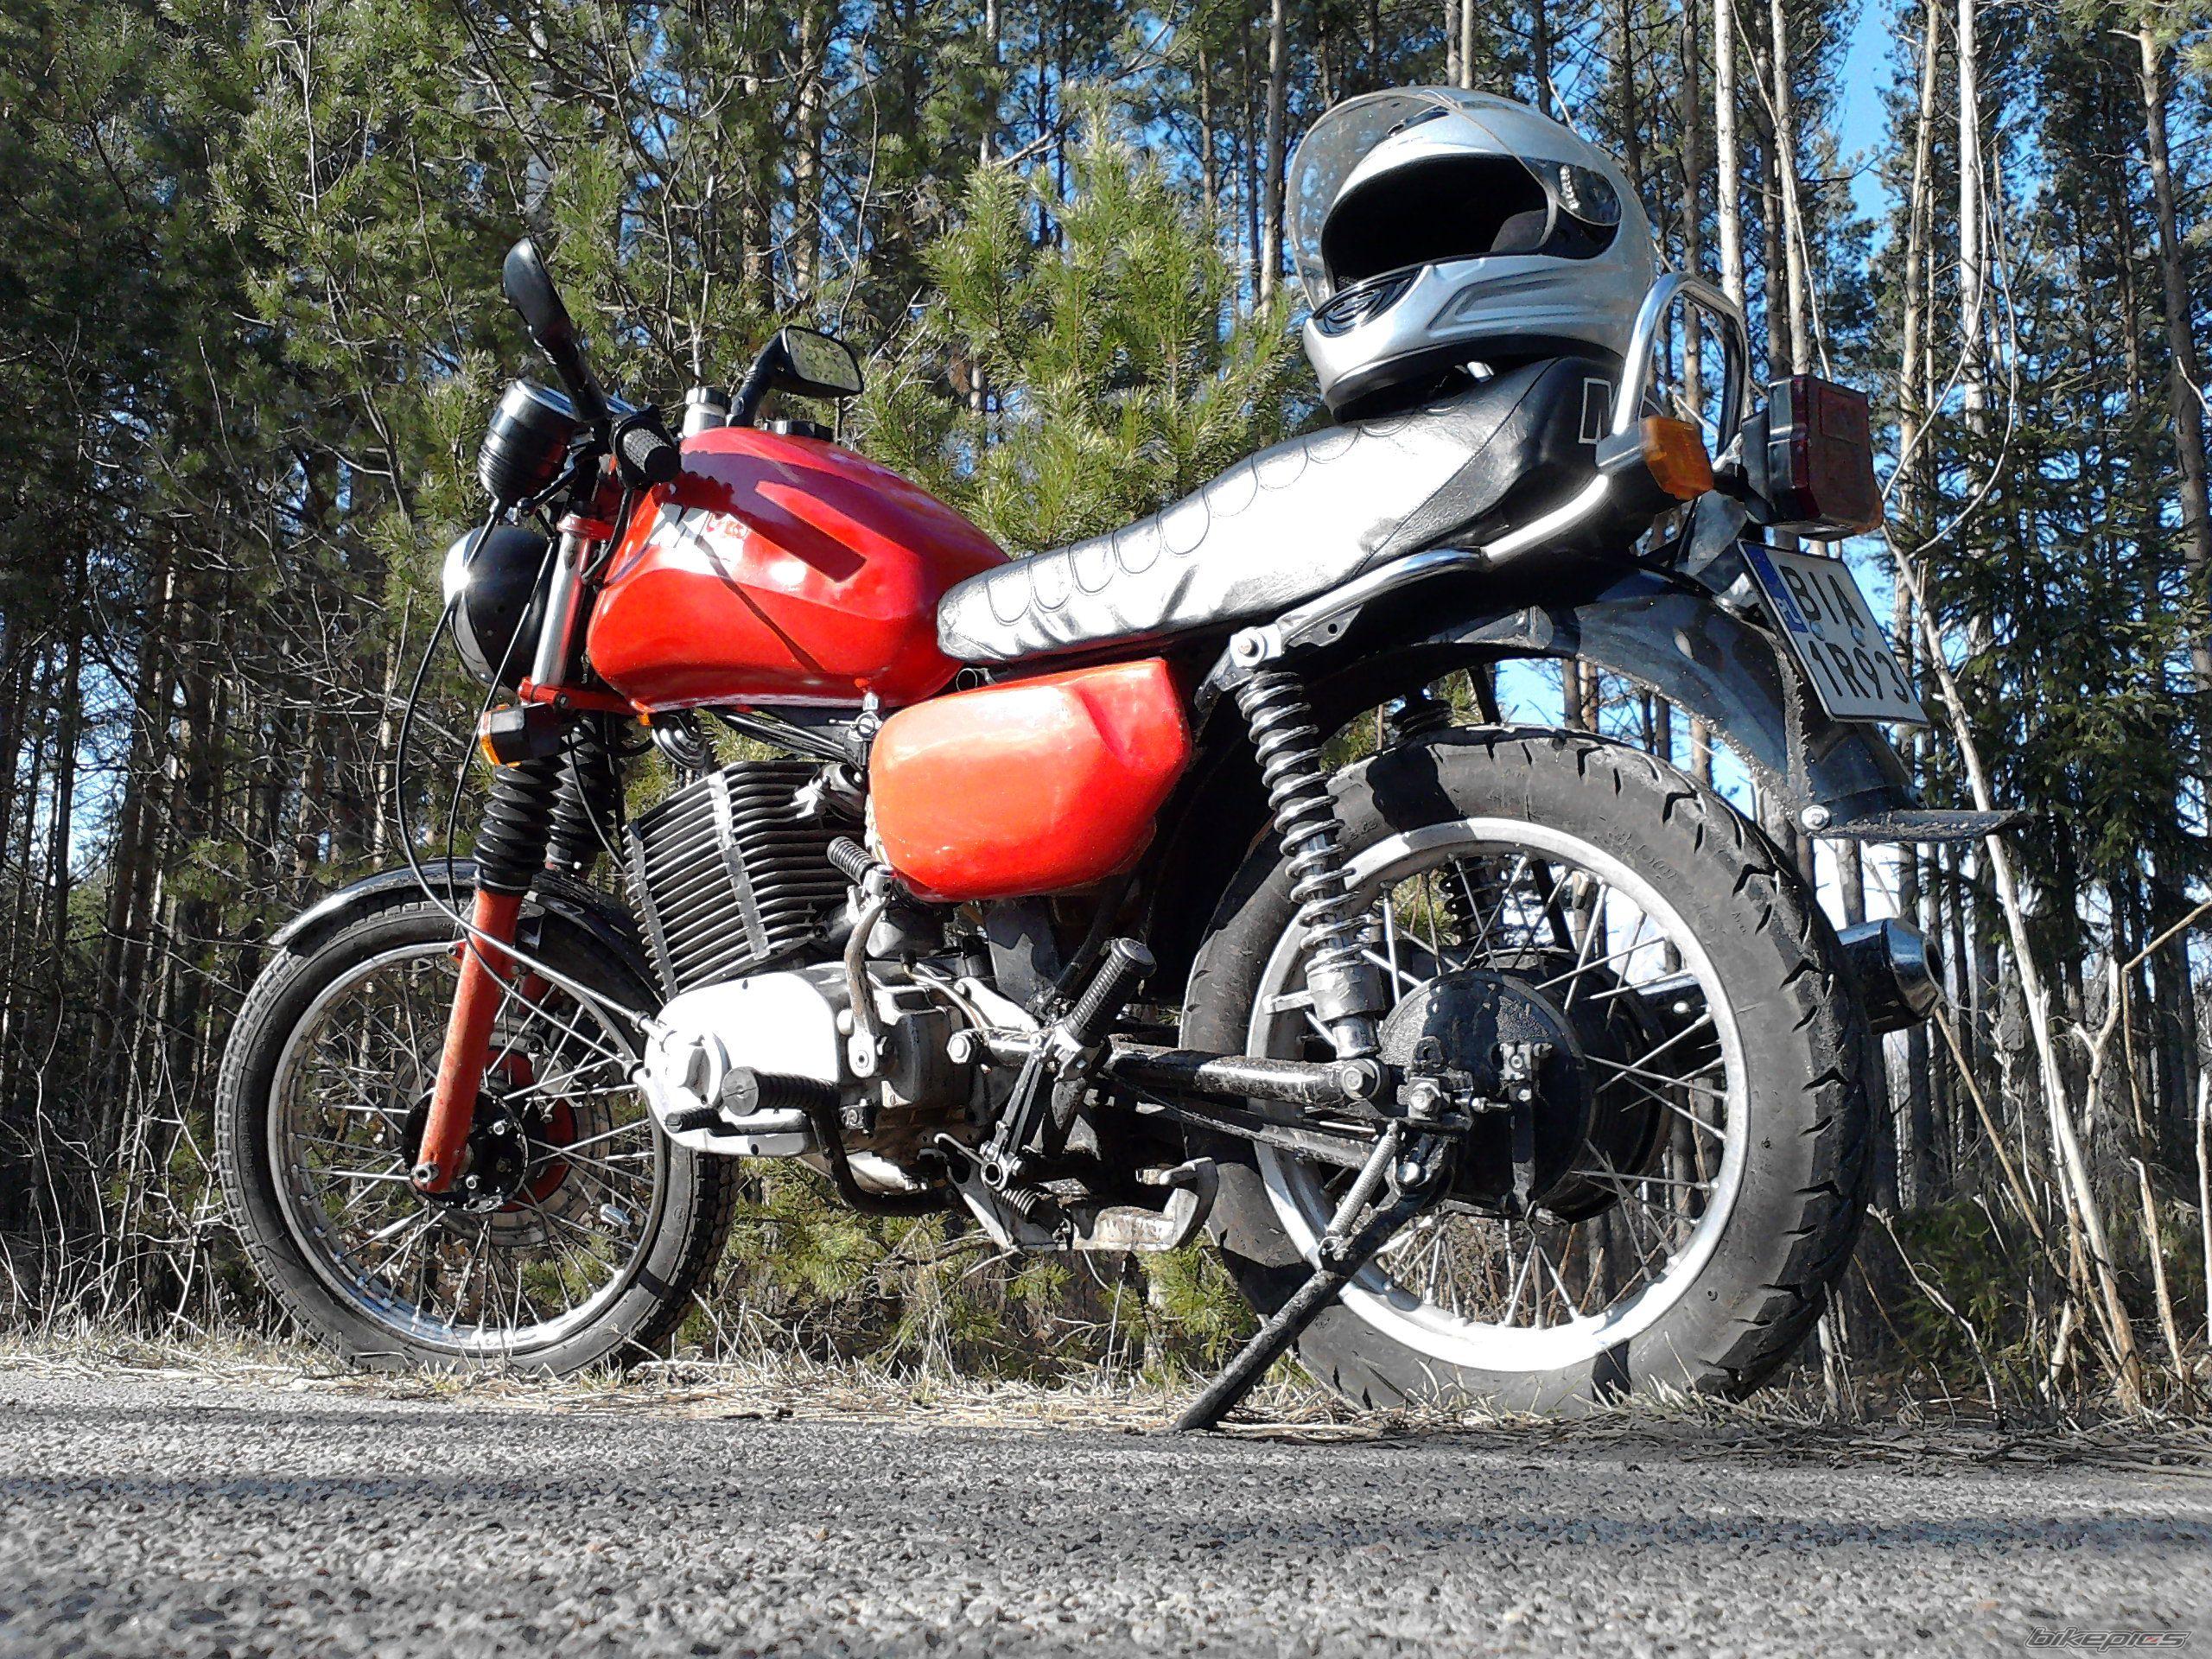 1990 MZ ETZ 251 | Ddr fahrzeuge, Kraftfahrzeug, Motorrad